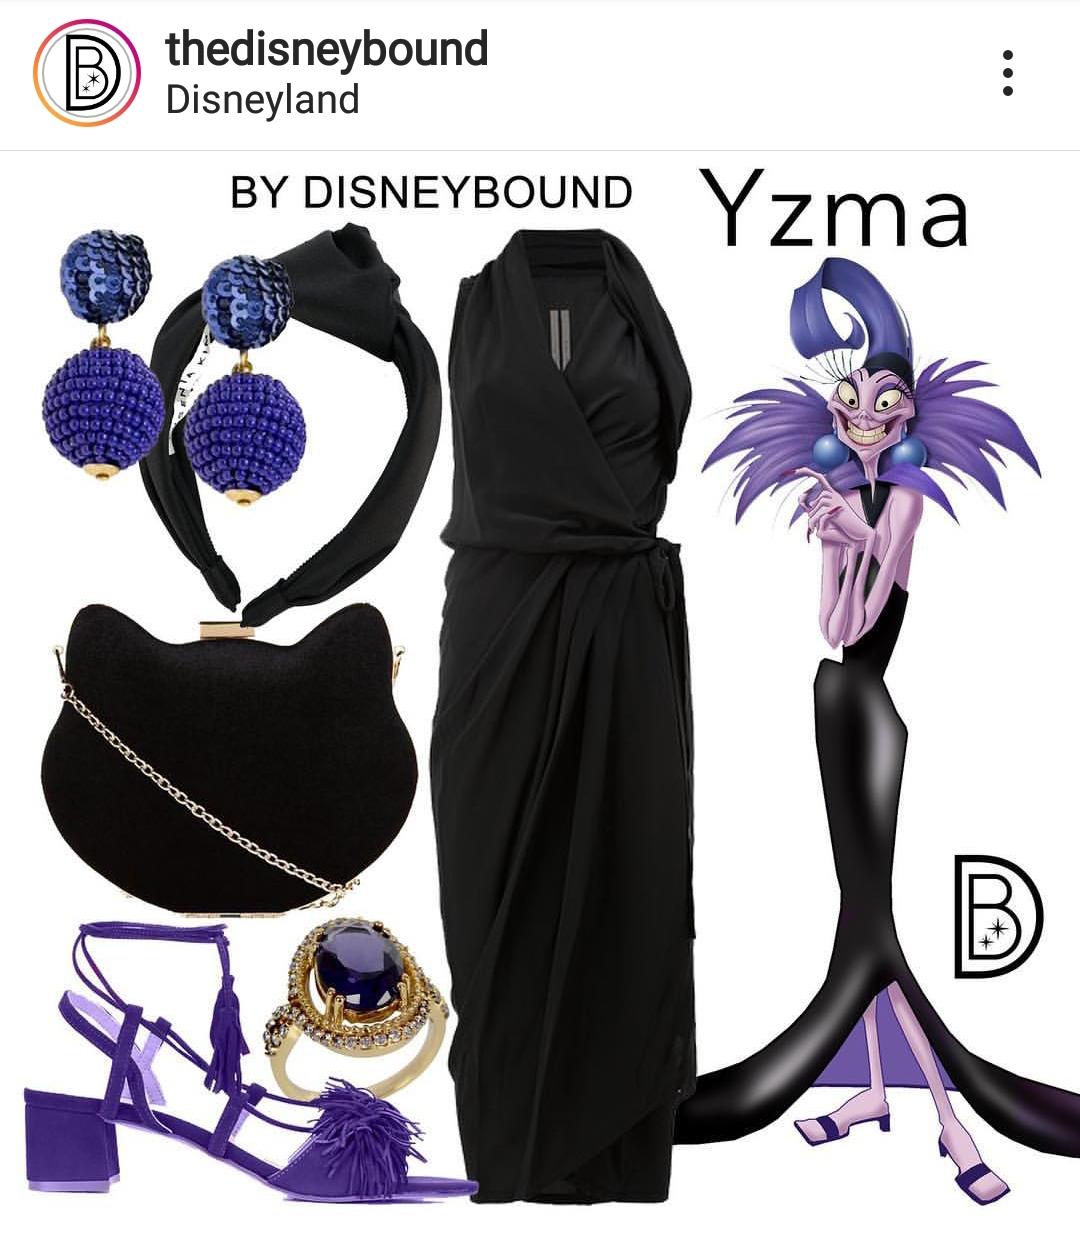 yzma-disneybound